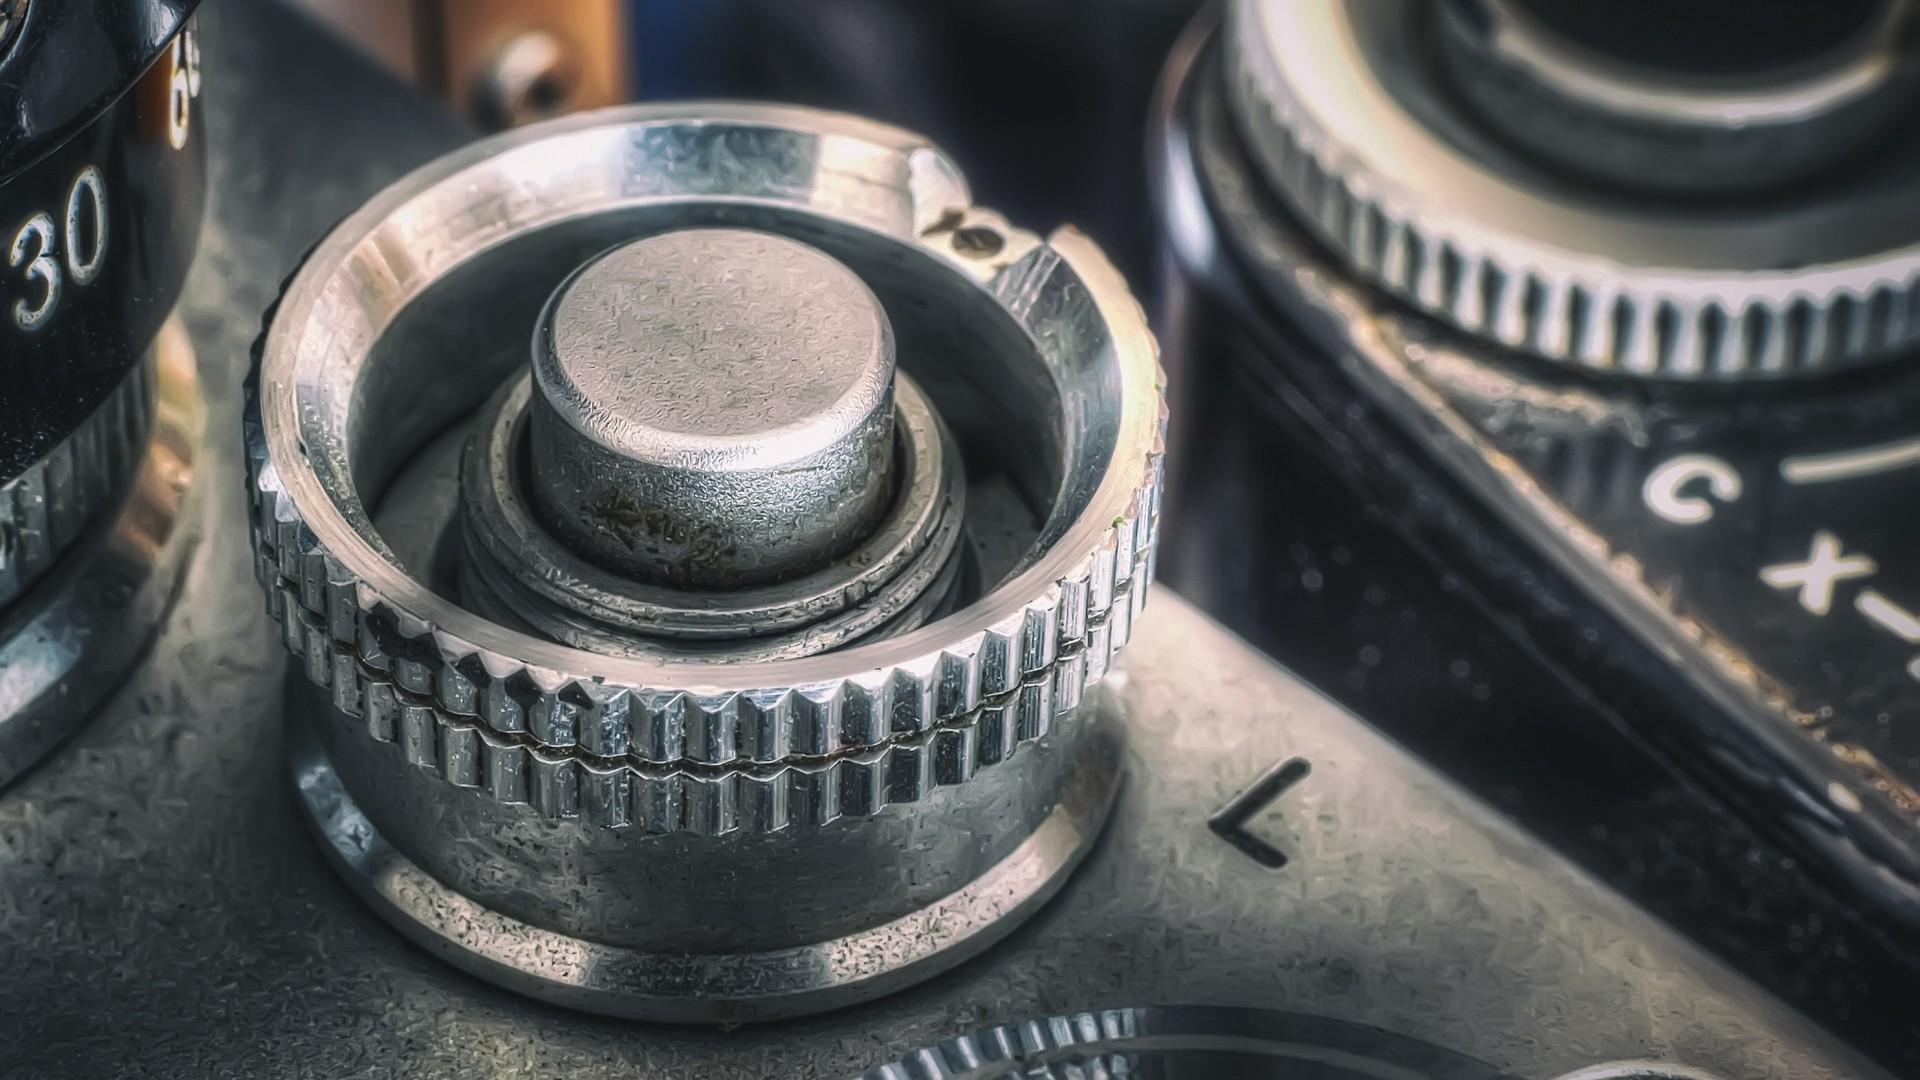 General 1920x1080 depth of field macro camera